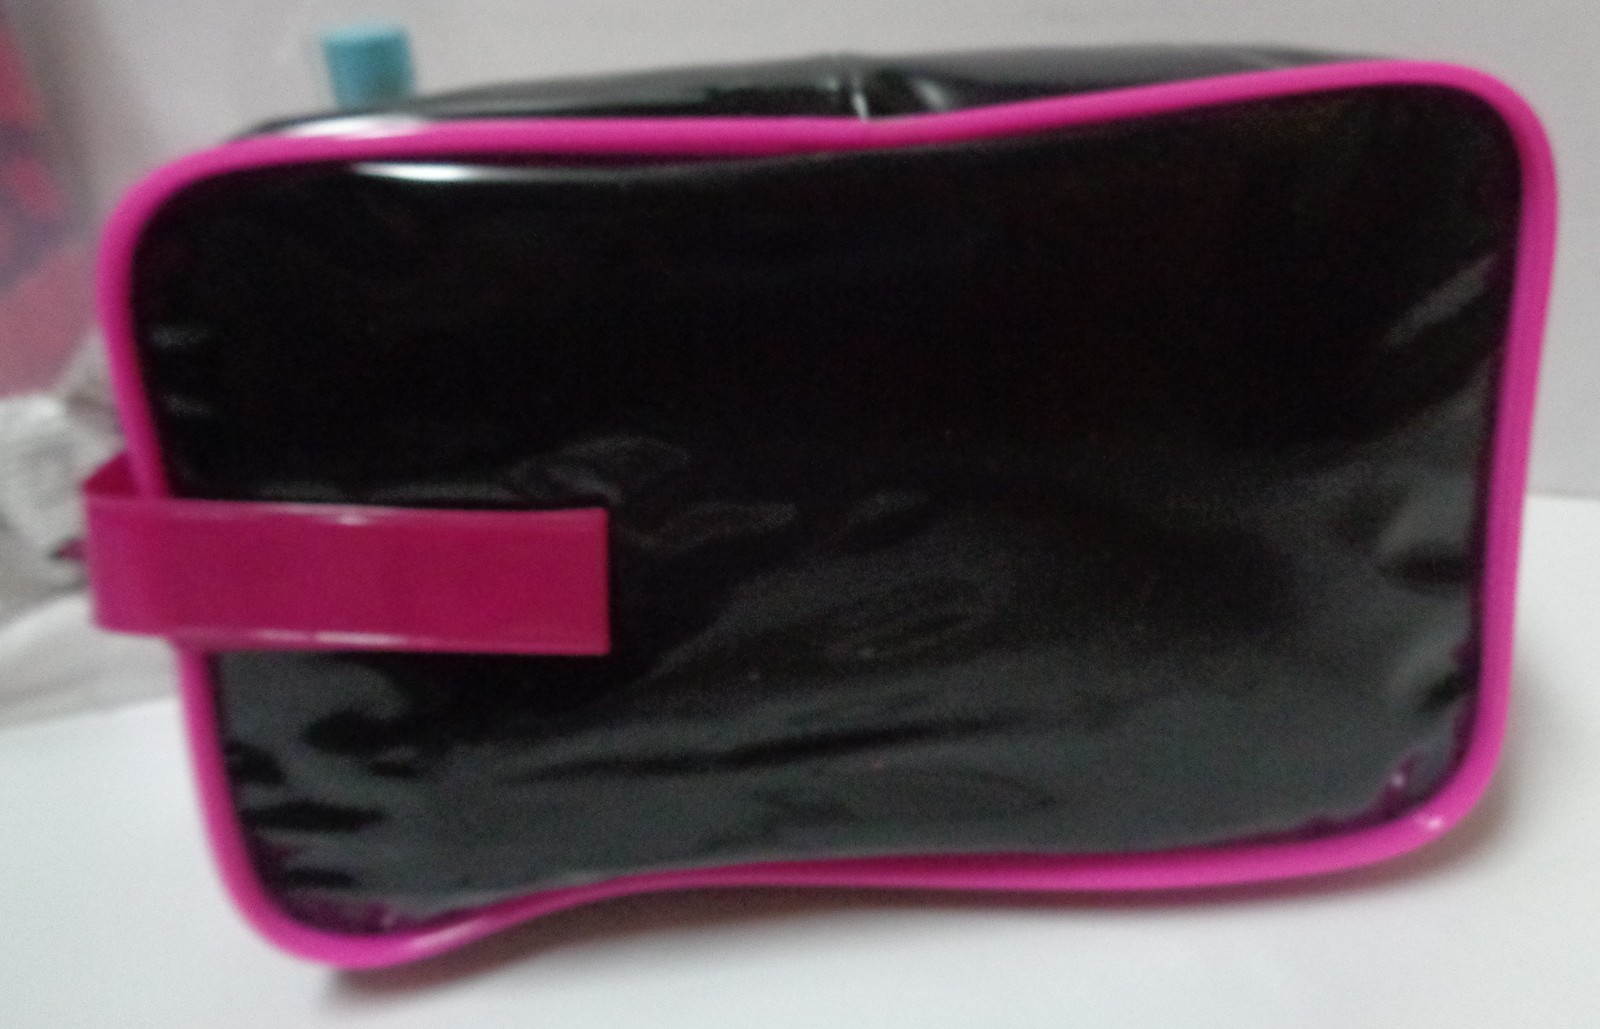 Girl's Beauty Sleep Over Kit Bratz Bag NIB Lotion Lip Balm Glitter Kitty Mask